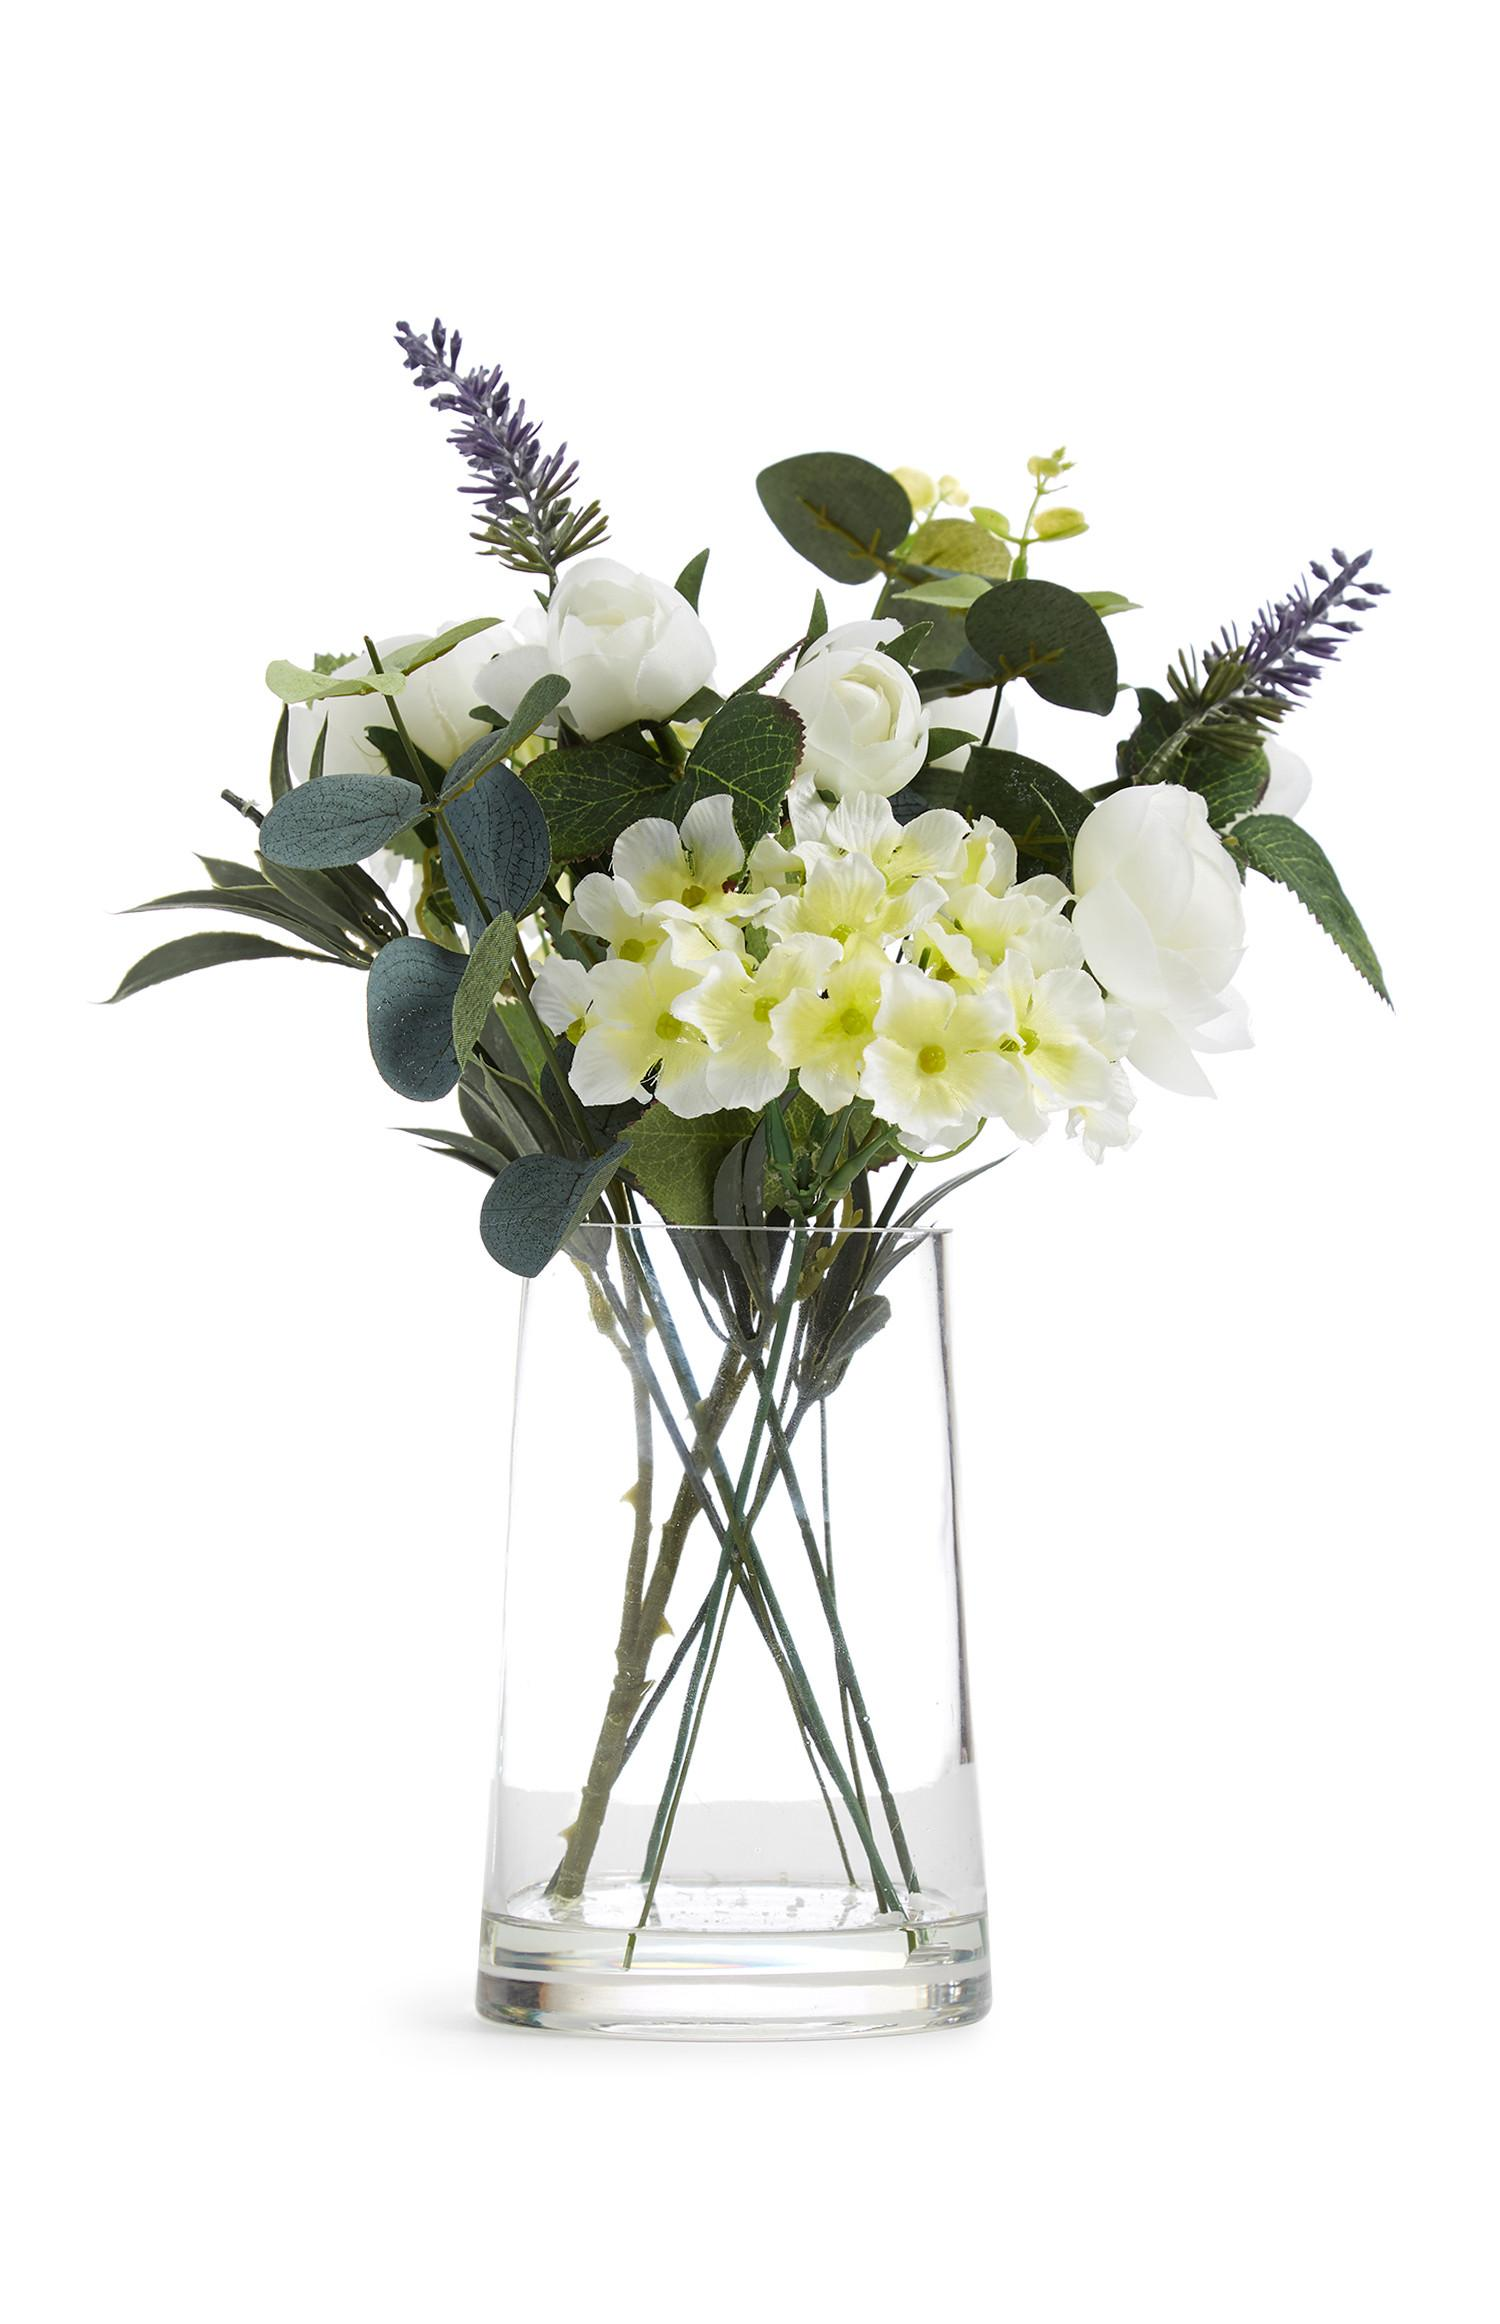 Large Mixed Flowers Vase  sc 1 st  Primark & Large Mixed Flowers Vase | Accessories | Homeware | Categories ...